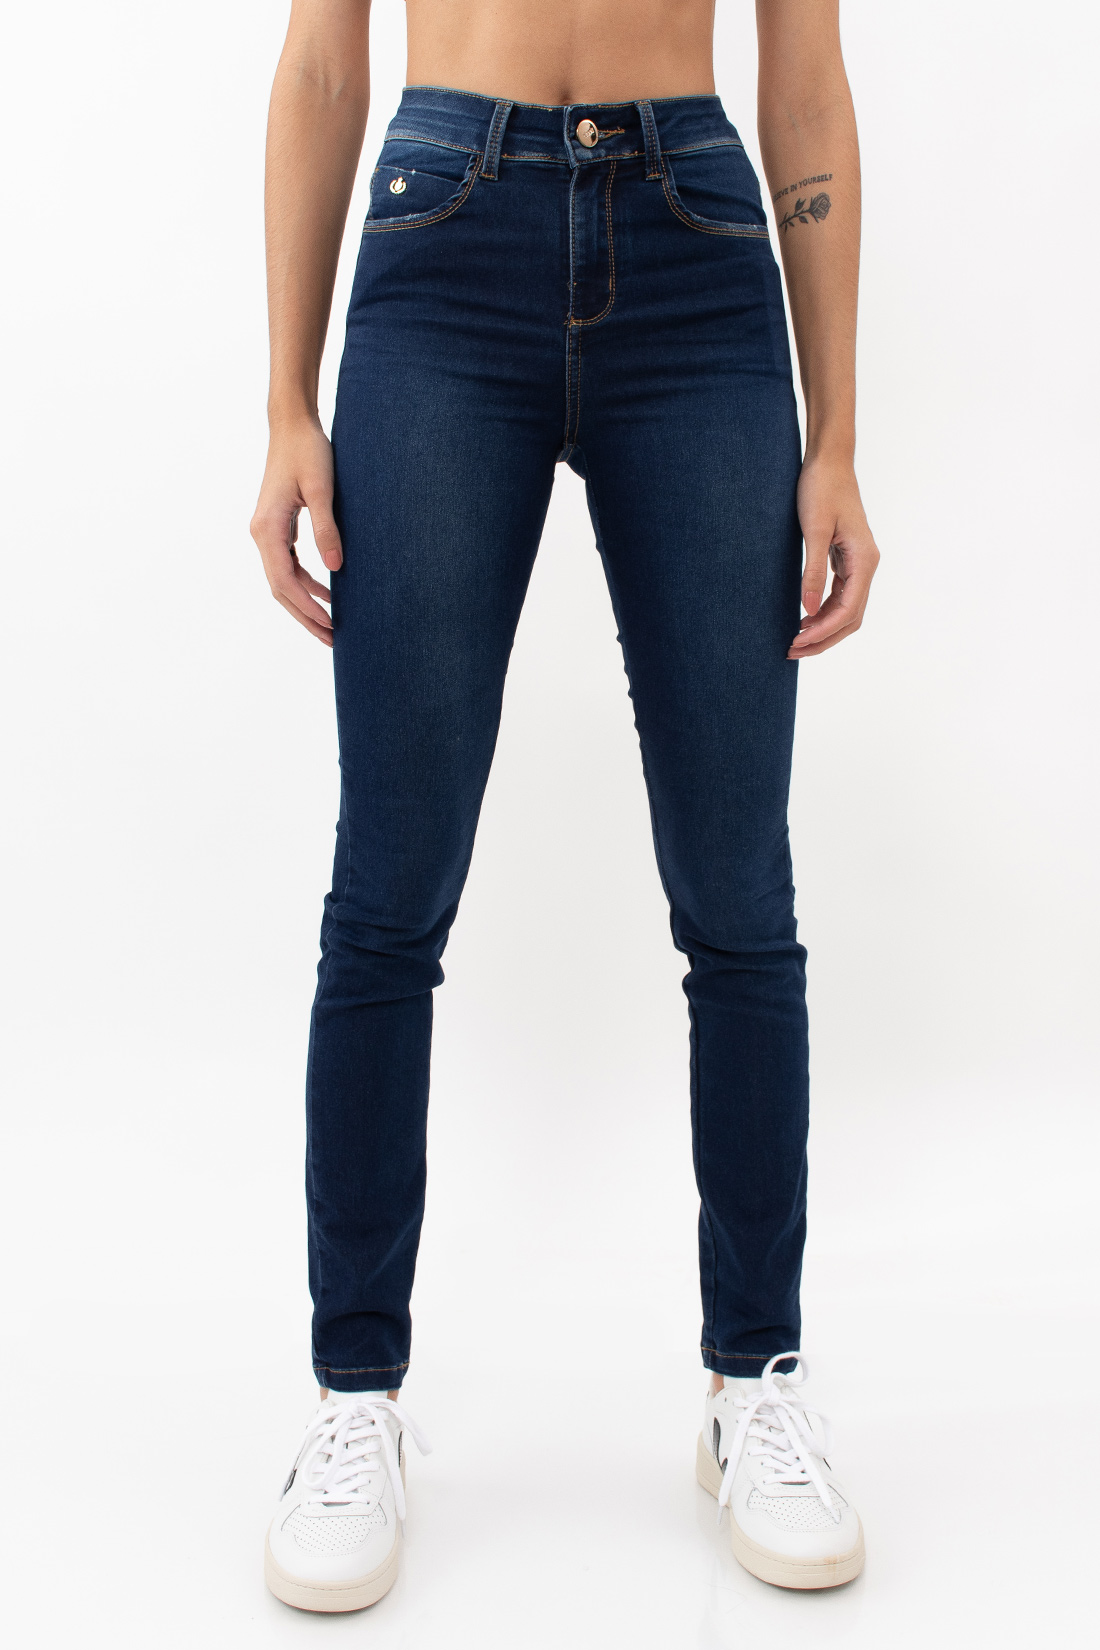 Calca Jeans Yexx Cigarrete